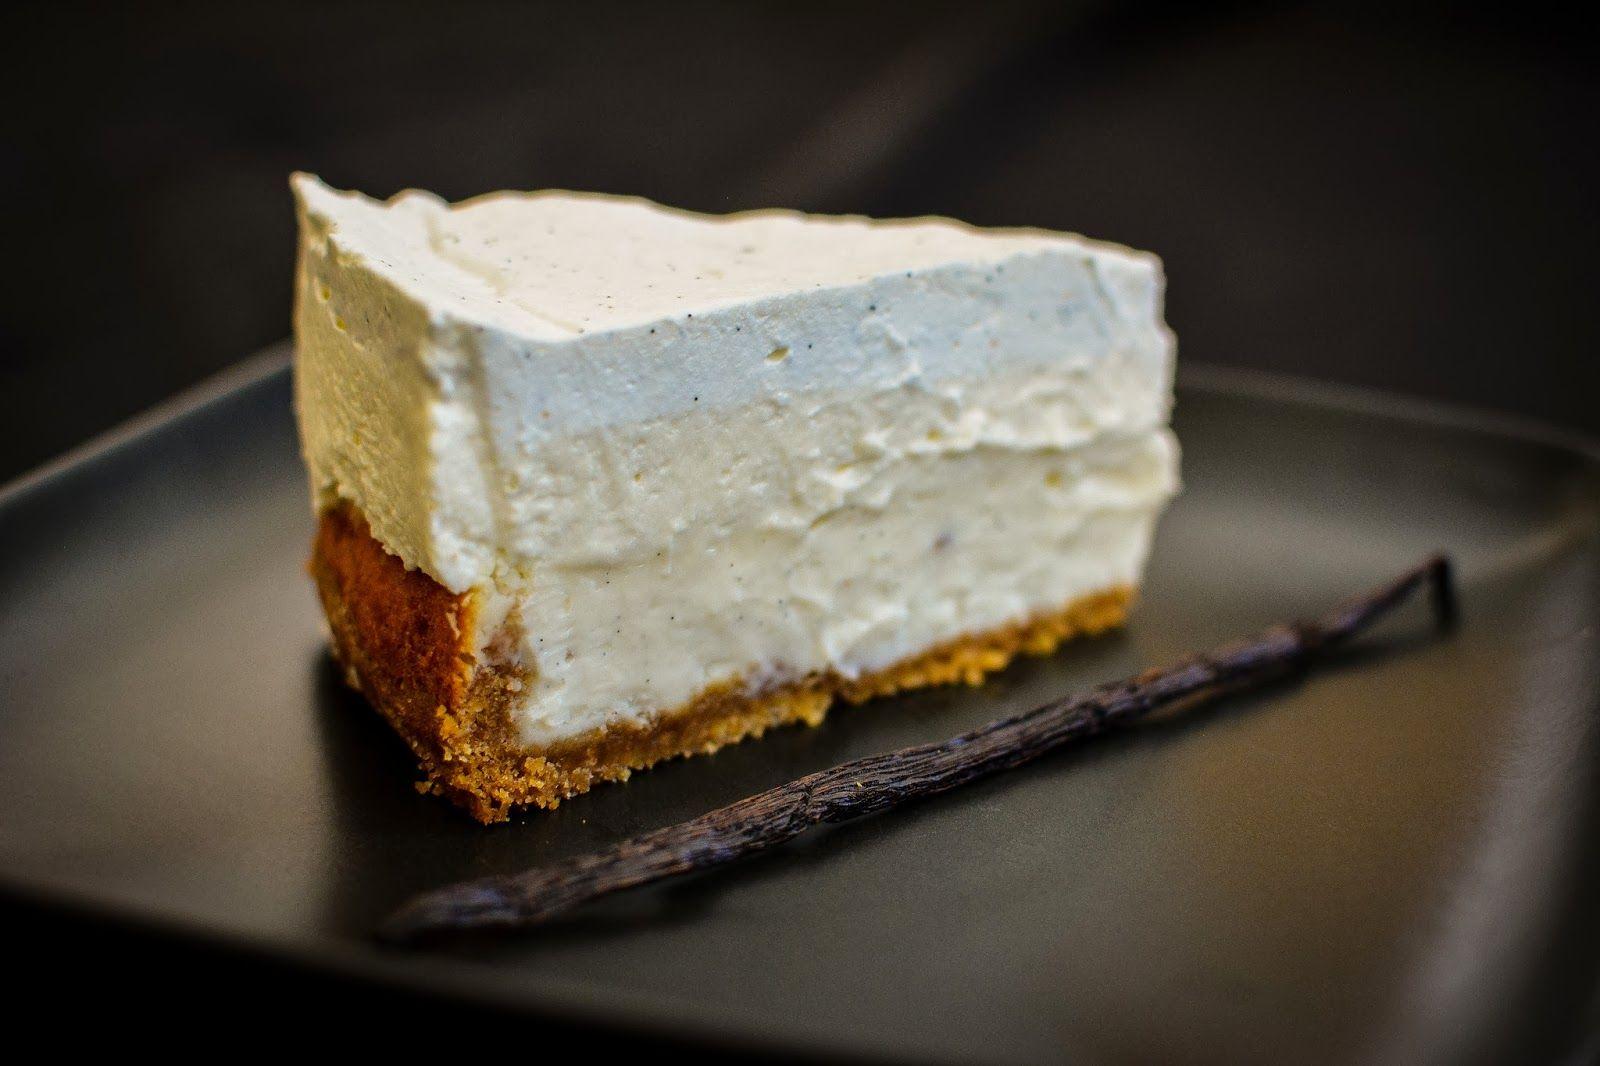 Vanilla Bean White Chocolate Mousse Cheesecake Yummy Sweets Chocolate Mousse Cheesecake Delicious Desserts